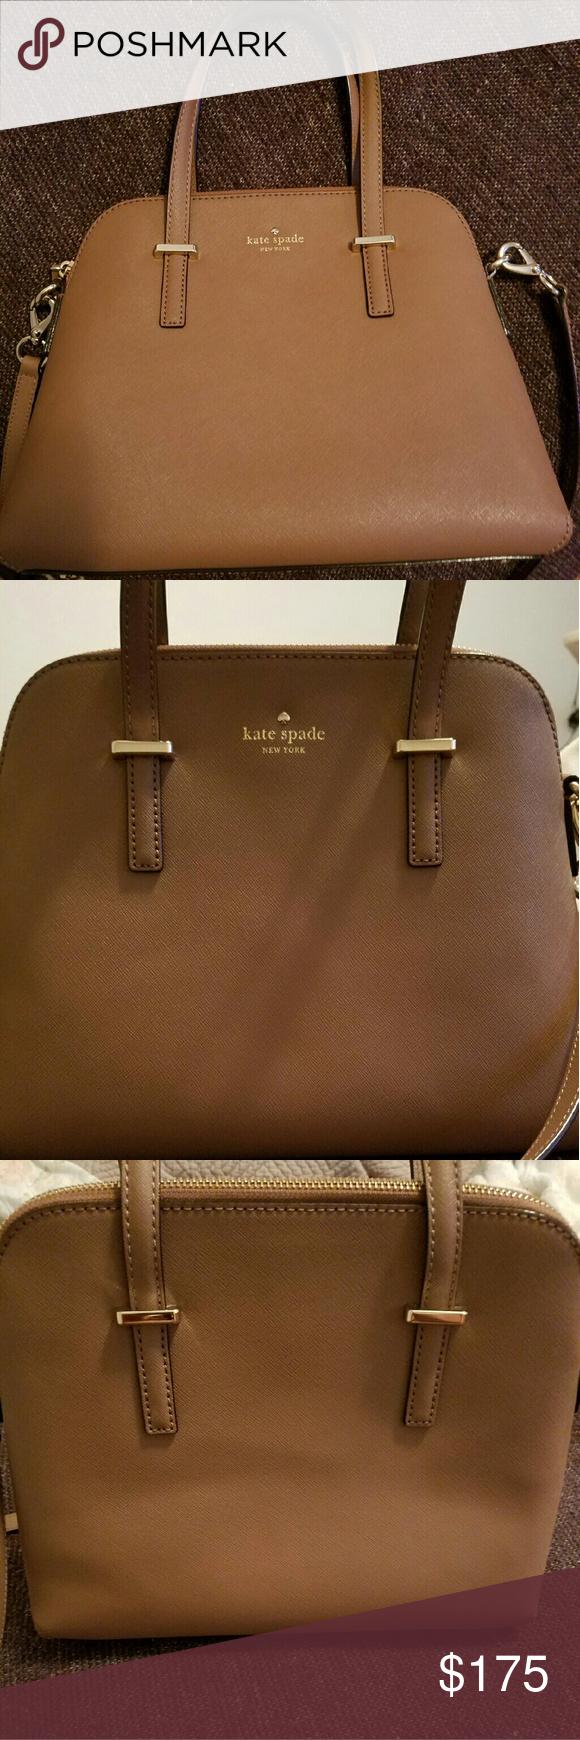 Like New Kate Spade Handbag Like New Kate Spade Handbag kate spade Bags Totes